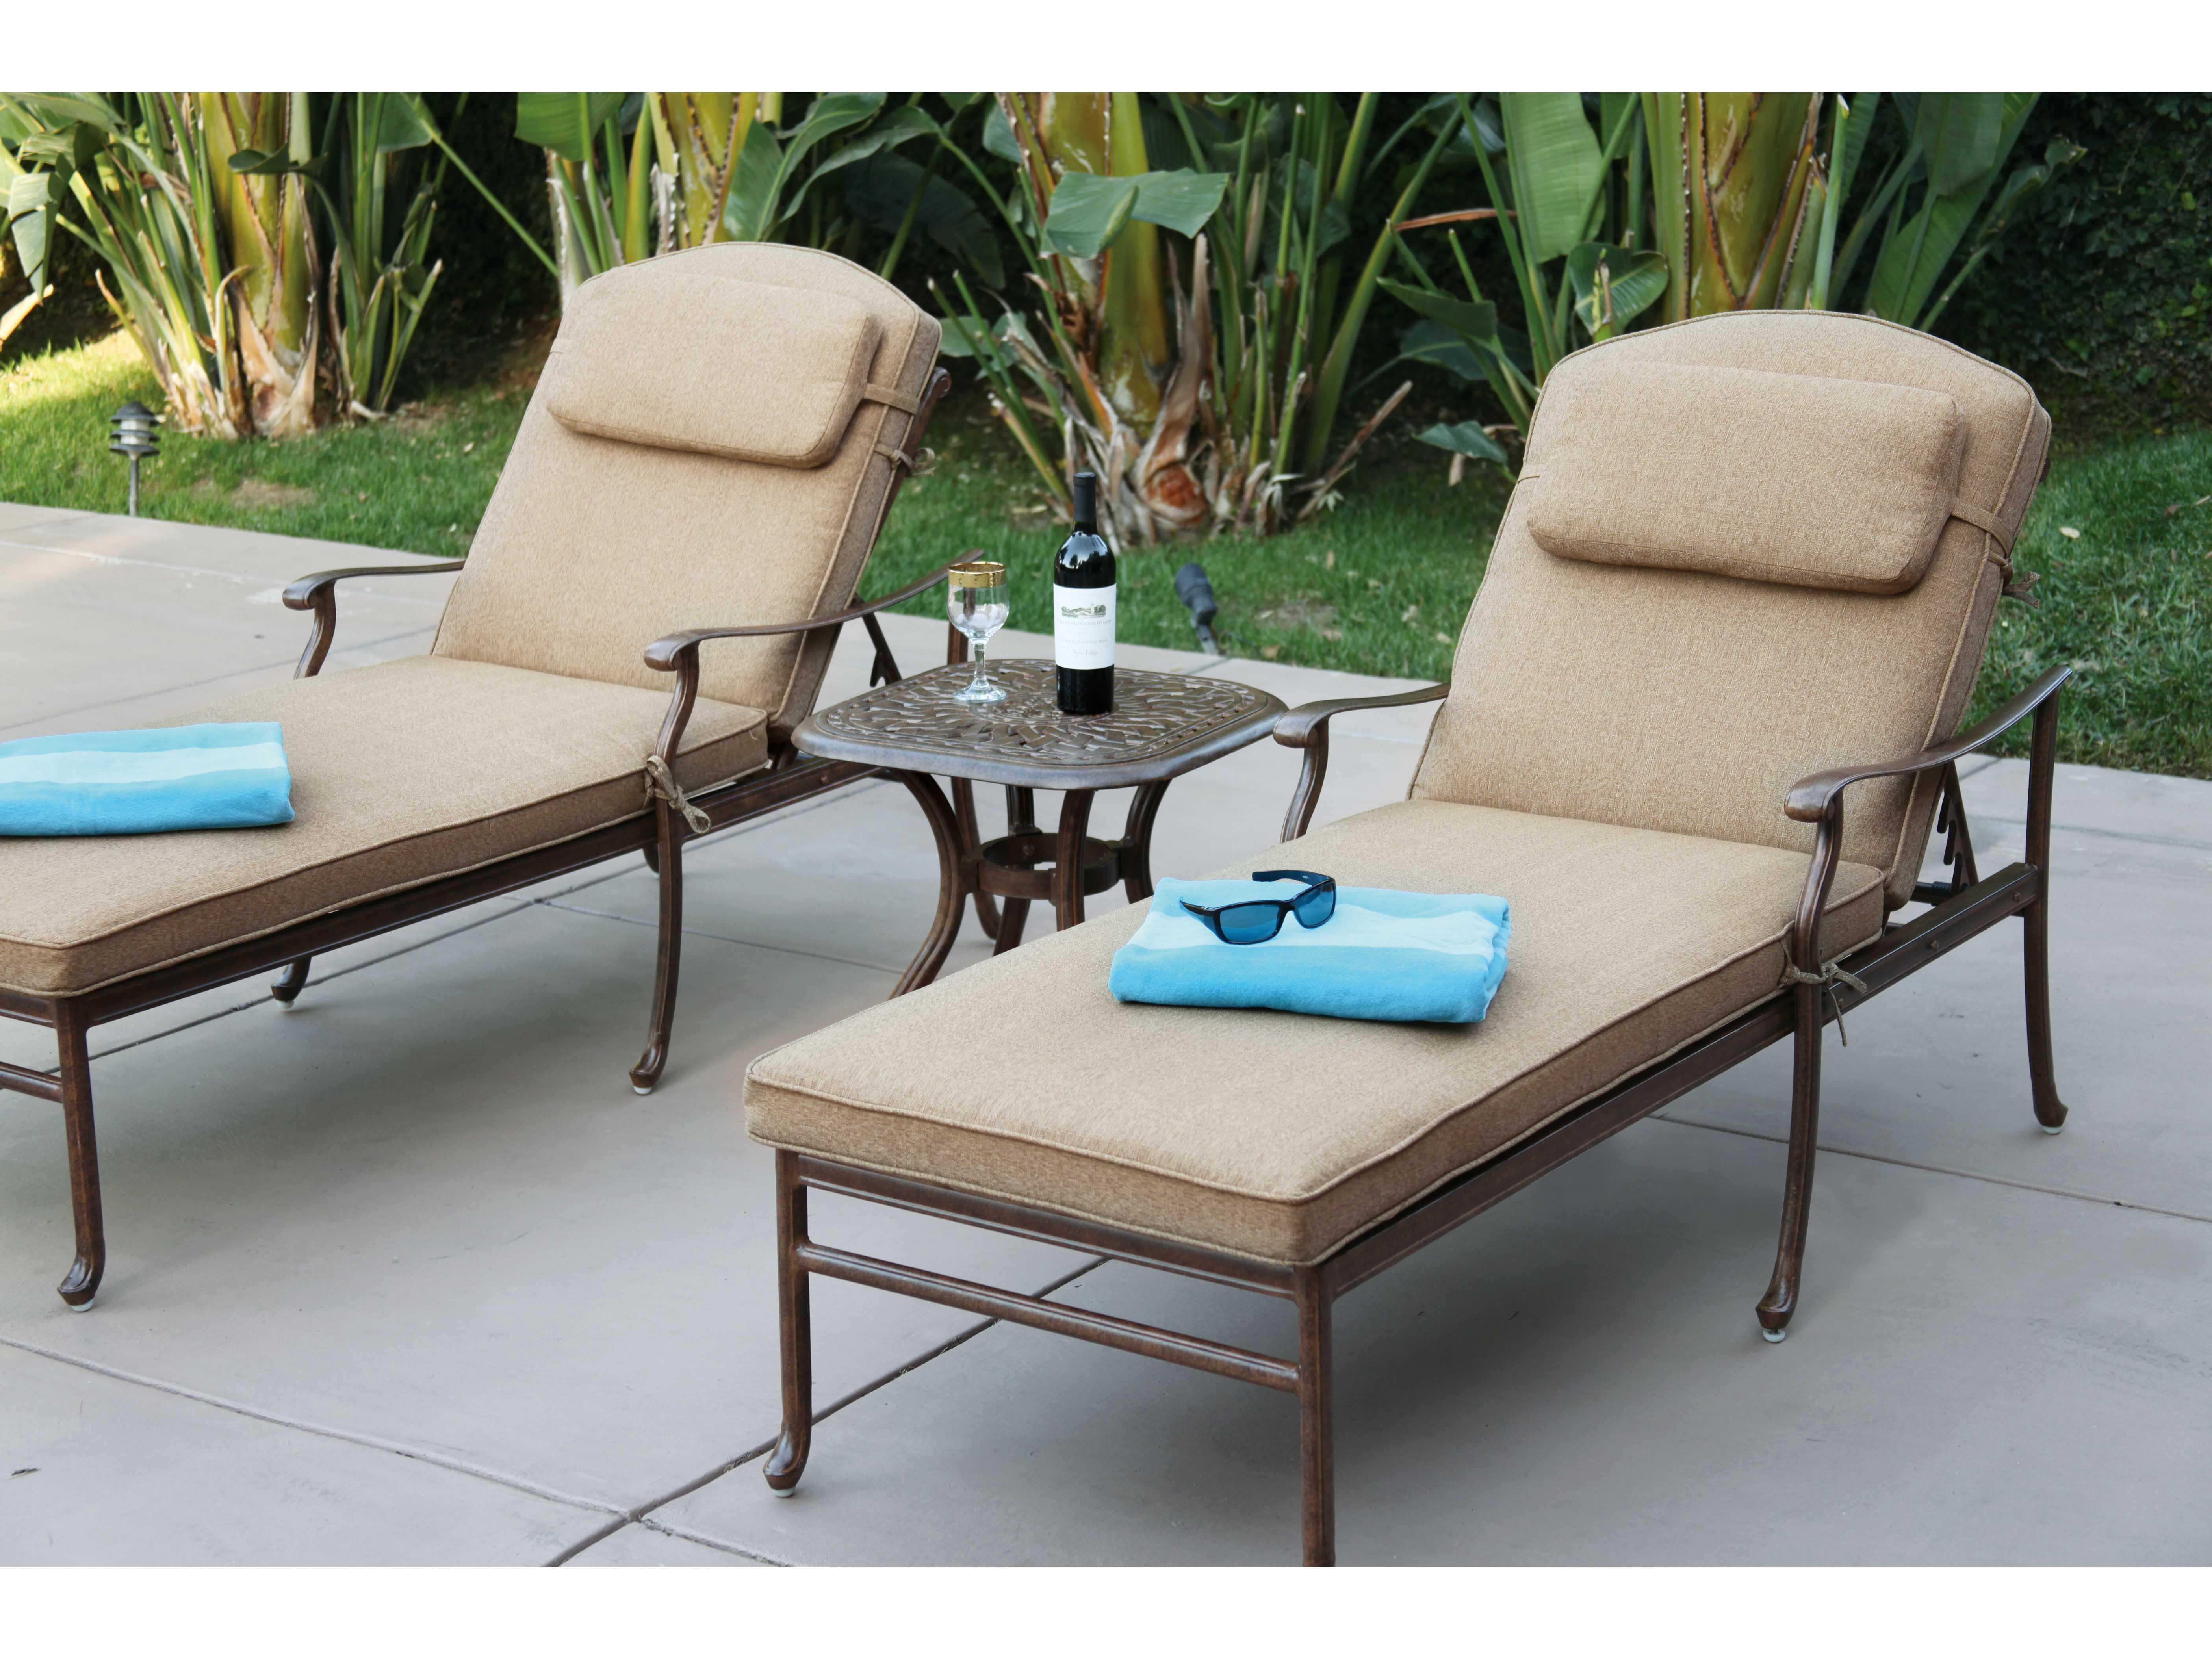 Darlee outdoor living florence cast aluminum chaise lounge for Aluminum chaise lounge outdoor